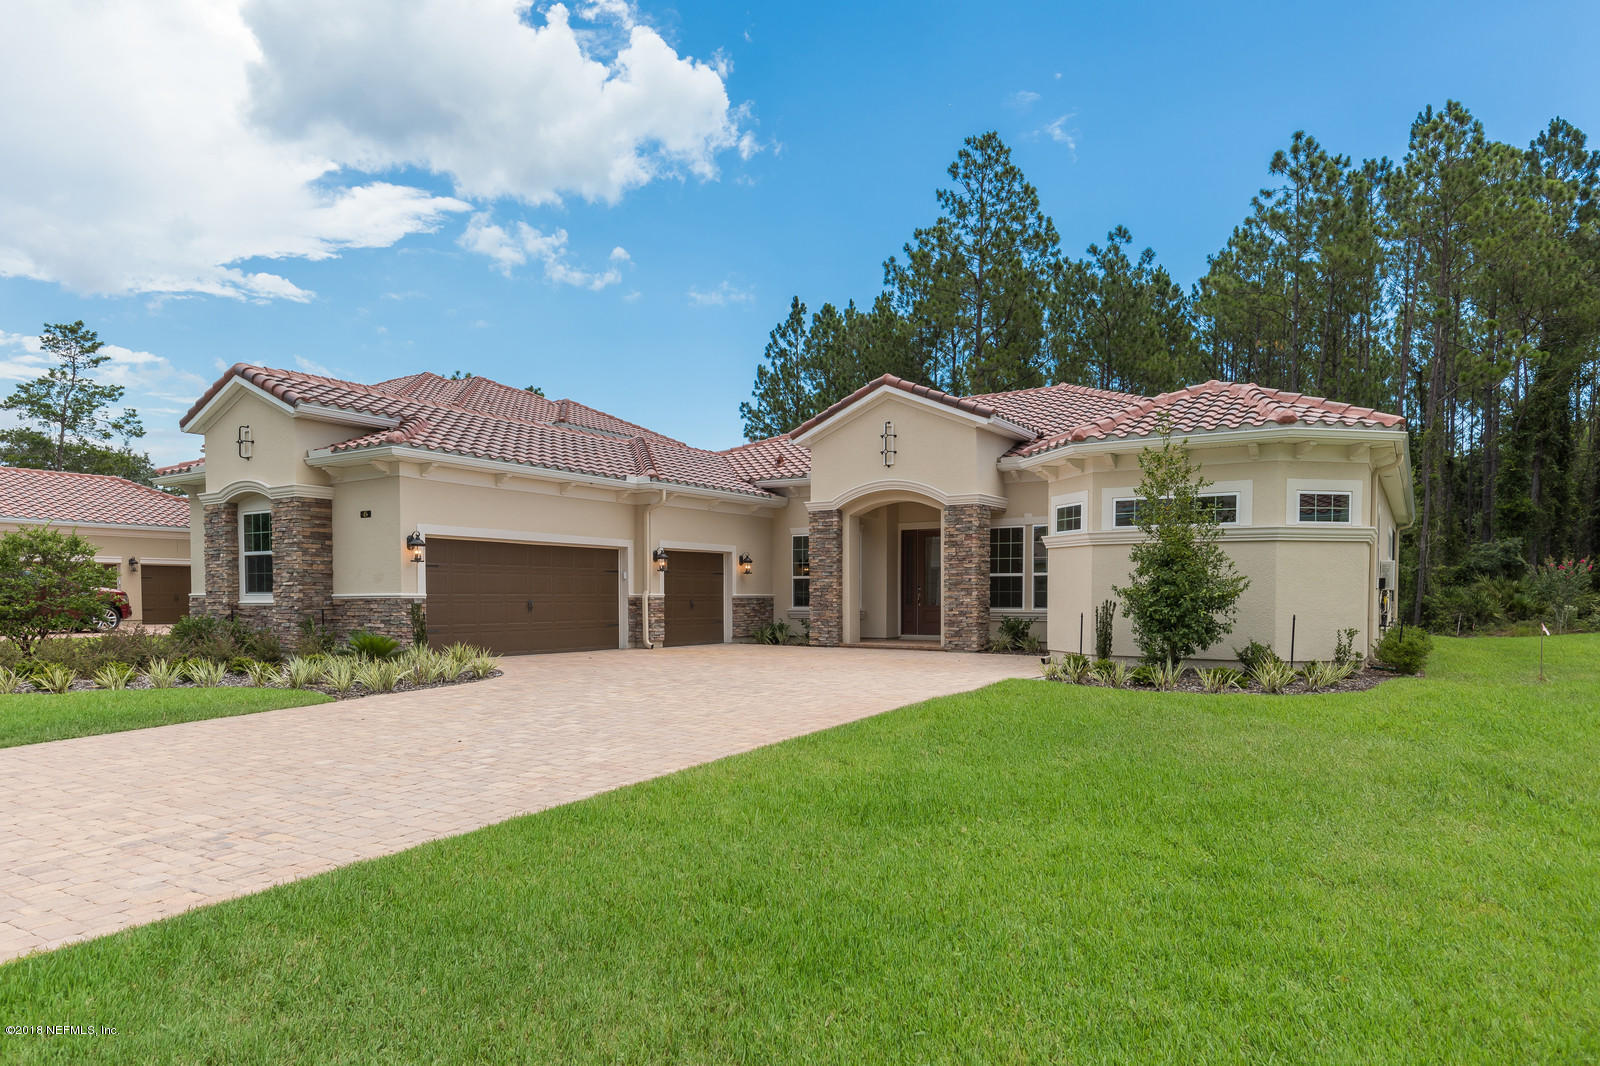 101 BARBELLA, ST AUGUSTINE, FLORIDA 32095, 4 Bedrooms Bedrooms, ,3 BathroomsBathrooms,Residential - single family,For sale,BARBELLA,958013